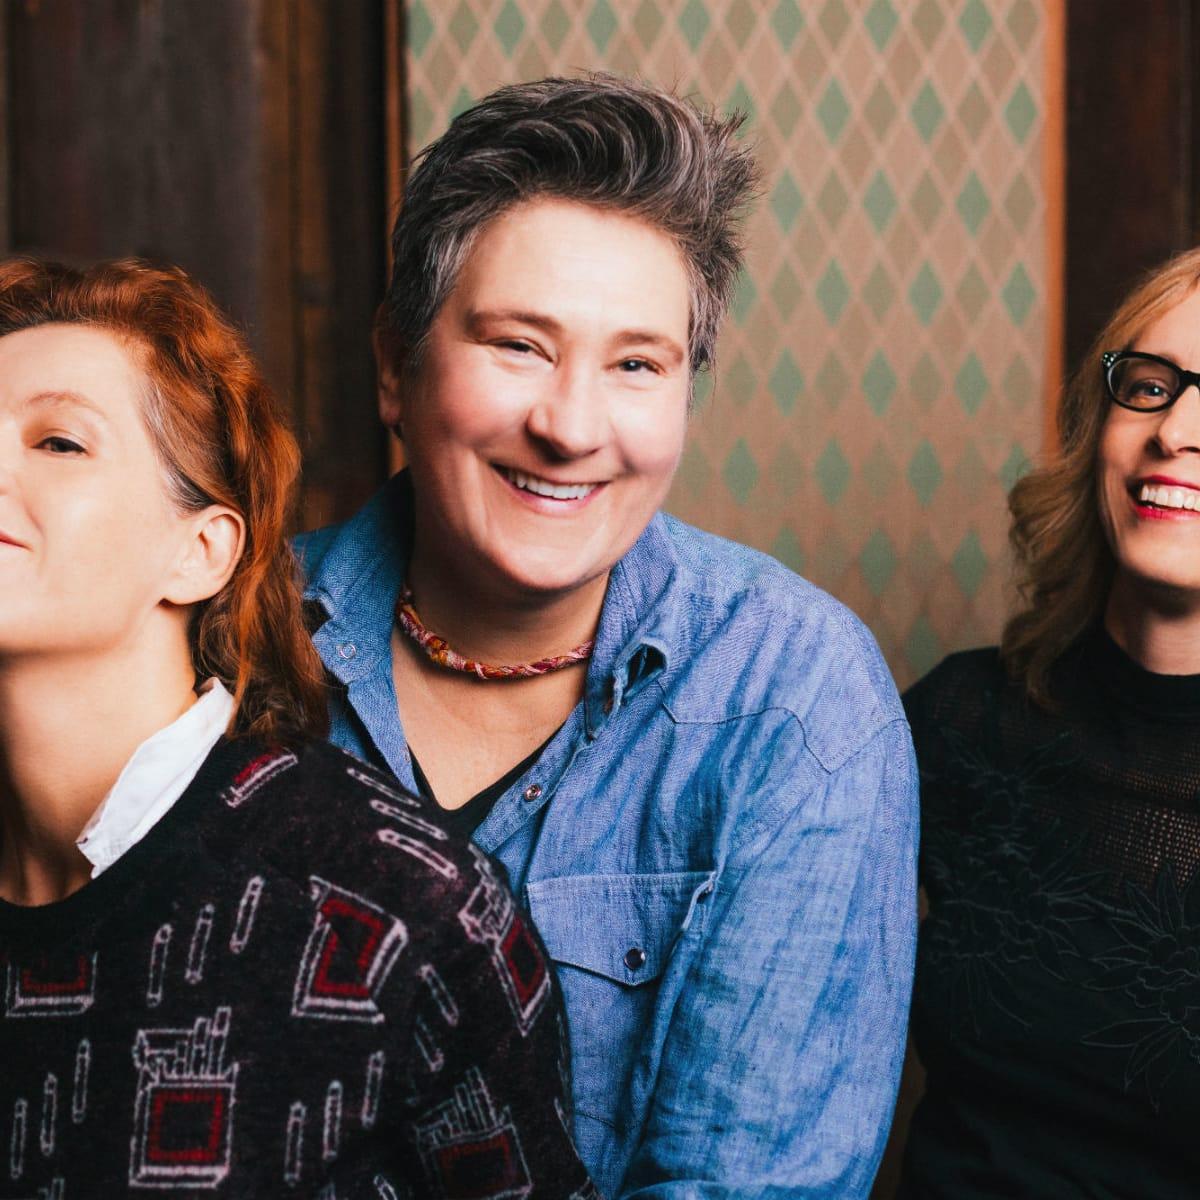 Neko Case, K.D. Lang, and Laura Veirs